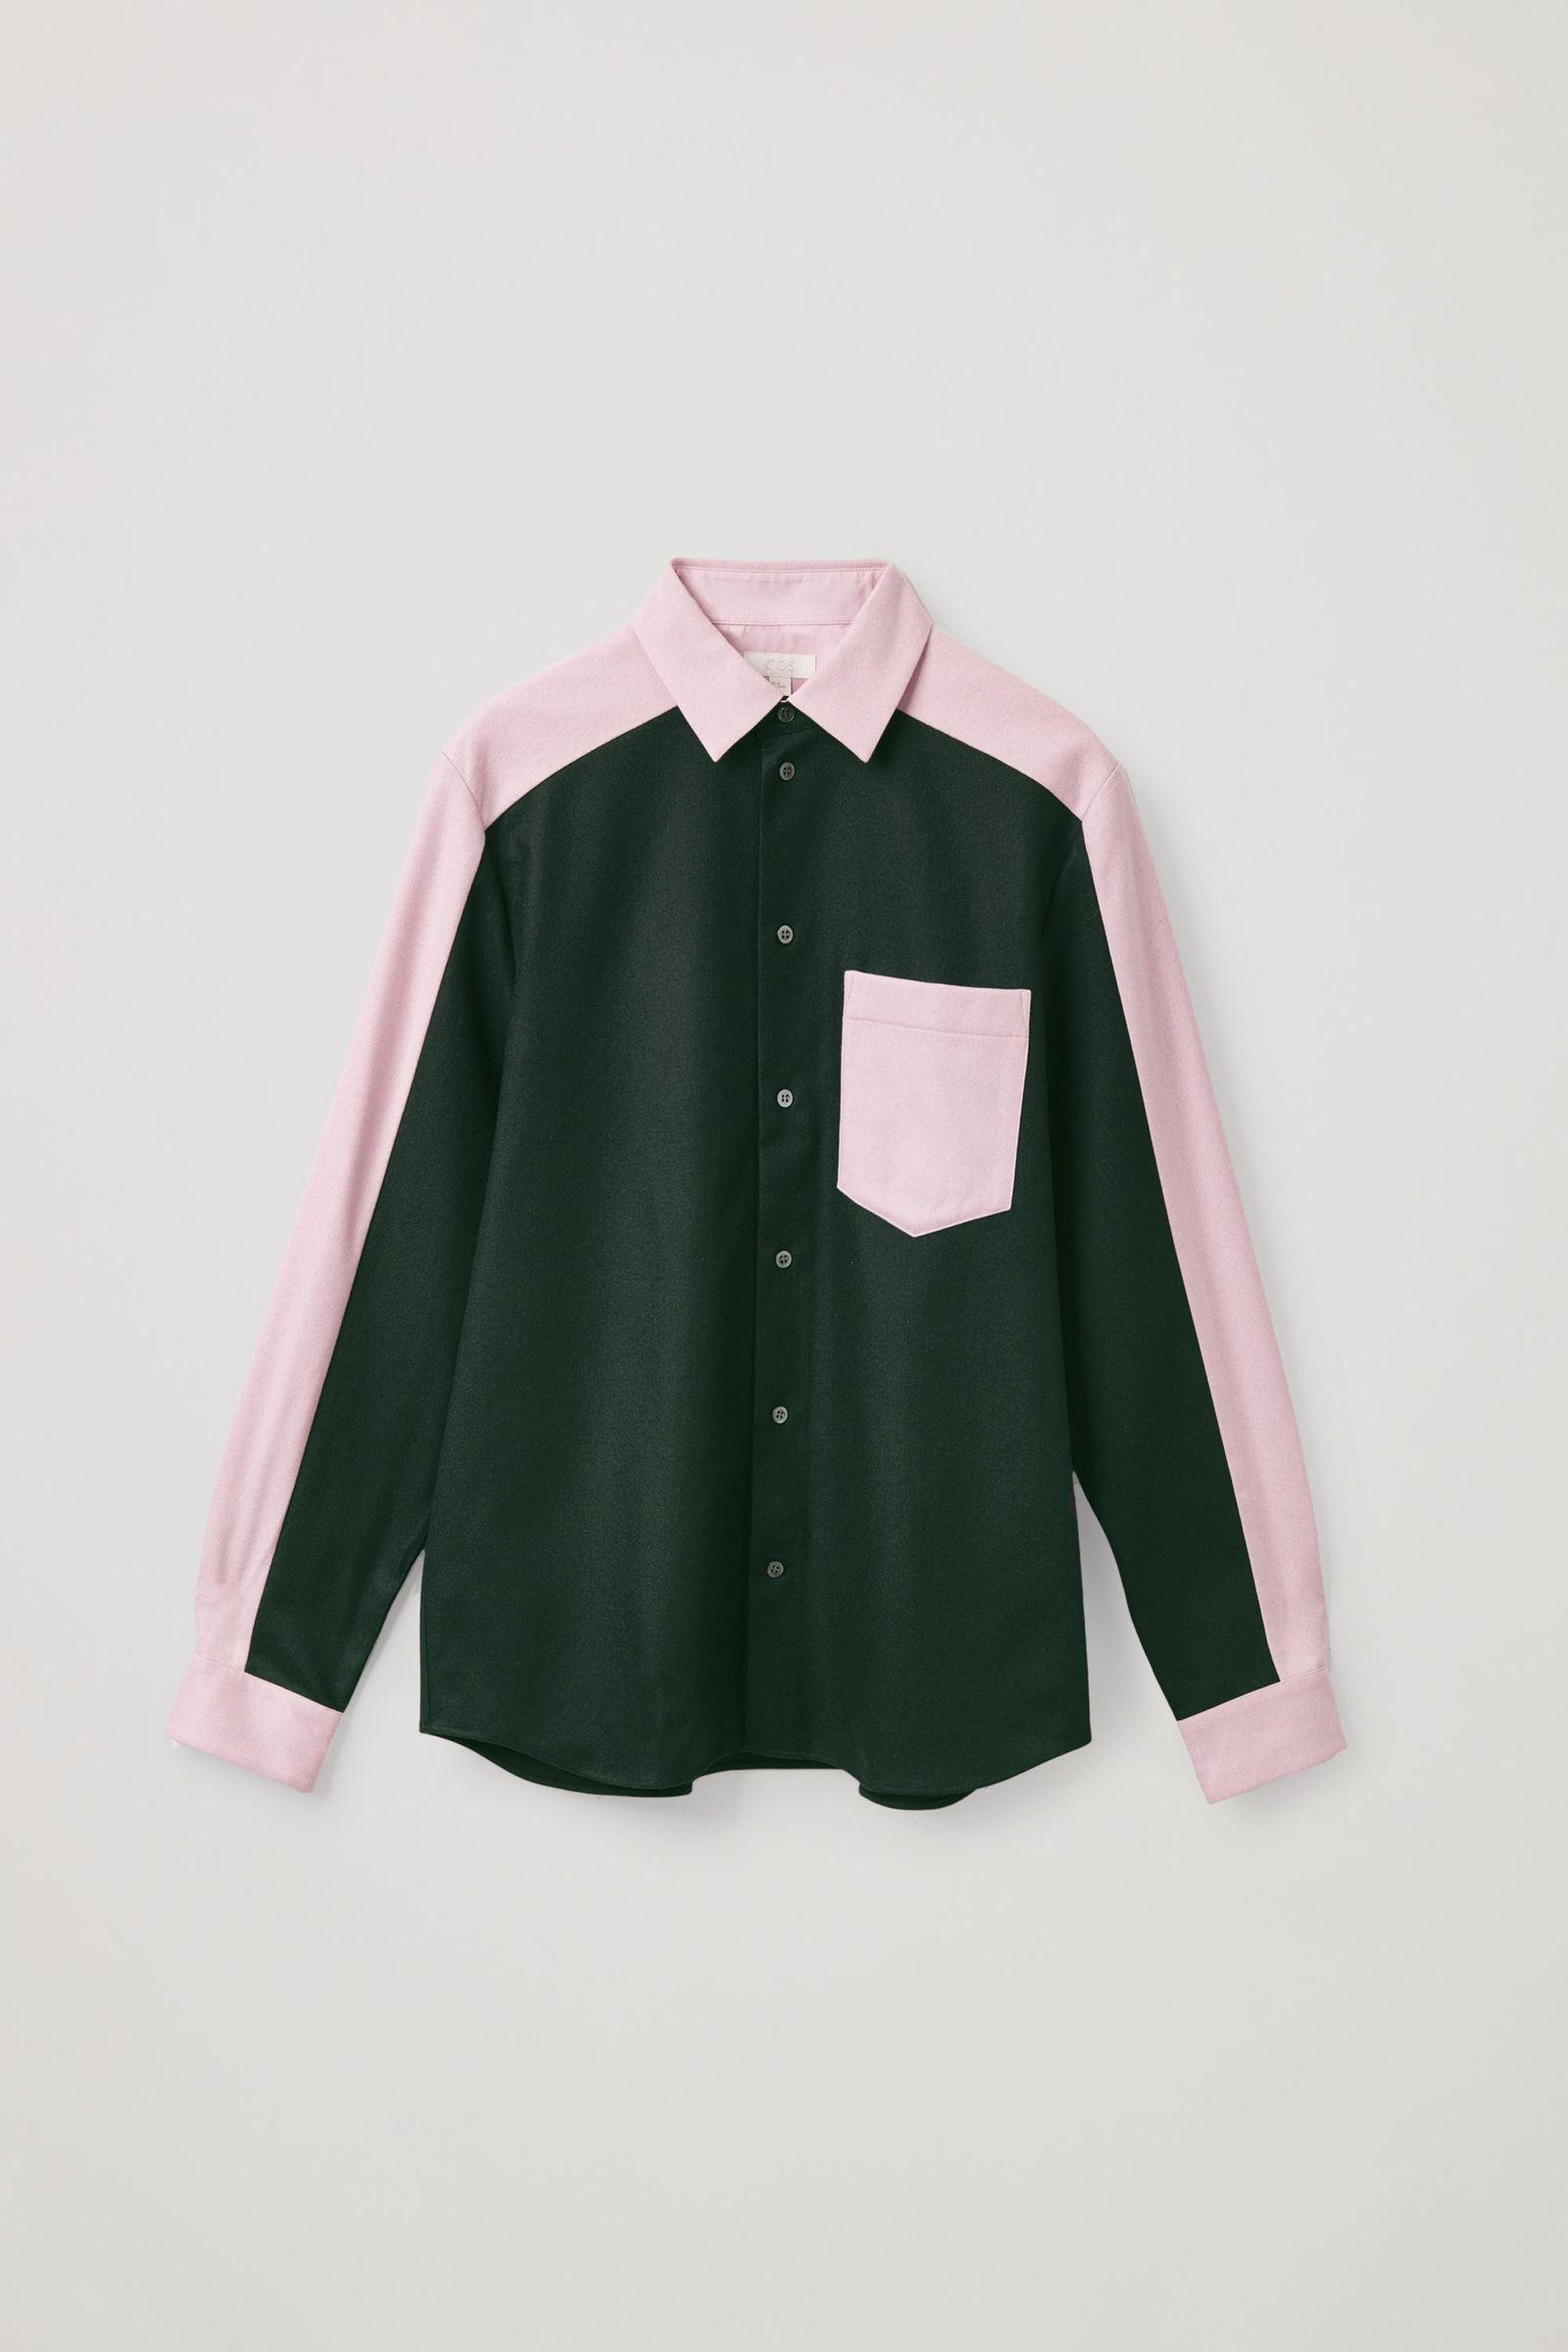 COS 펠트 이펙트 컨스트럭티드 패널 셔츠의 다크 그린 / 핑크컬러 Product입니다.